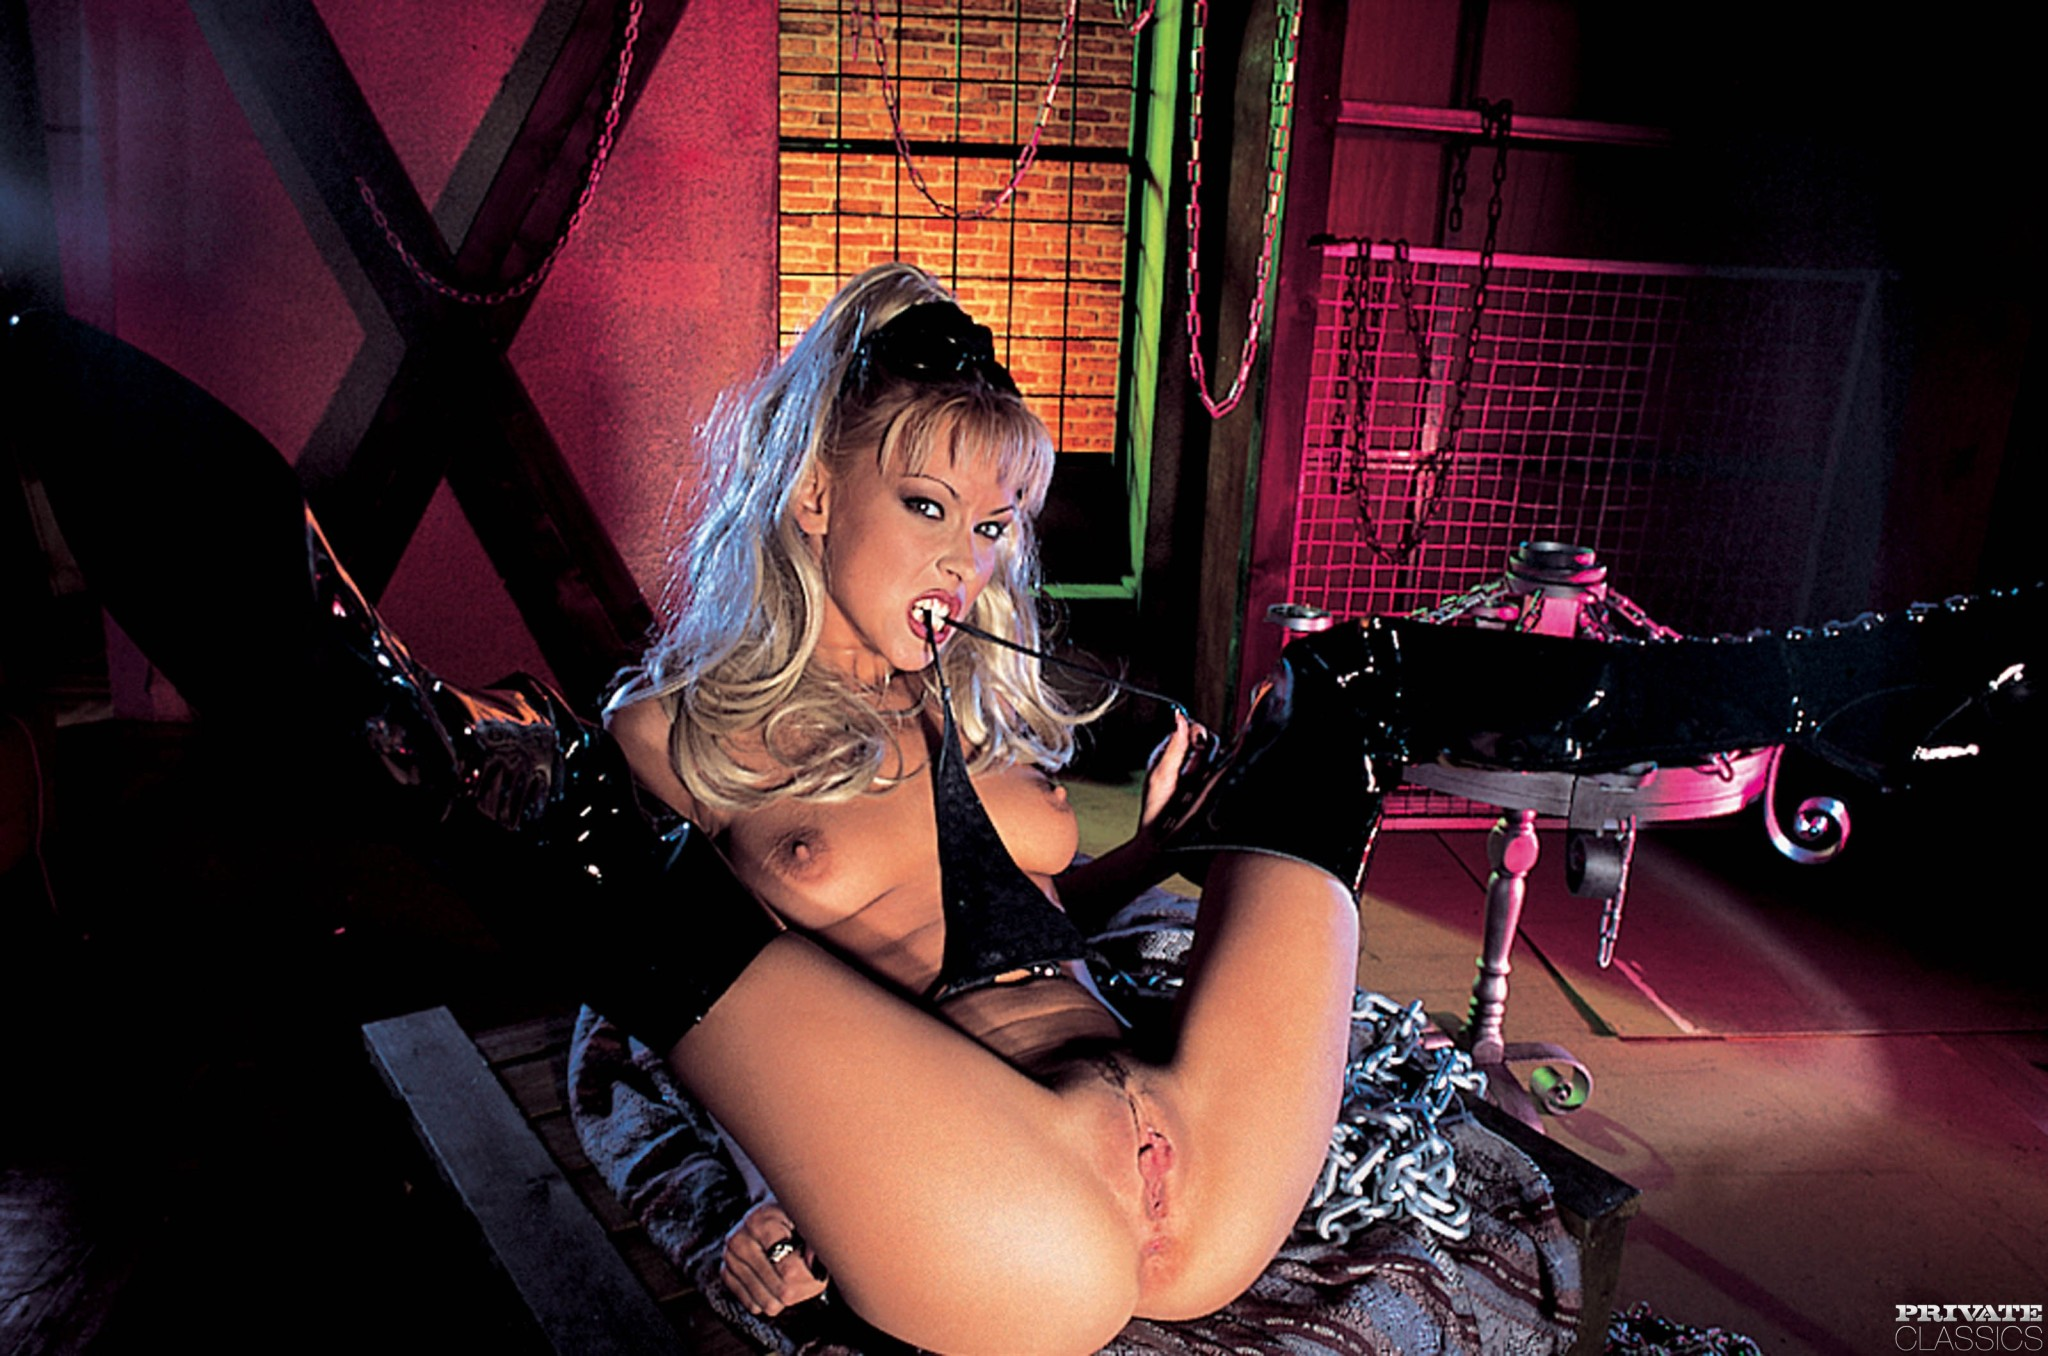 Privateclassics nikky blond amanda nikky blonde girls pornstars titts exposed yes porn pics xxx